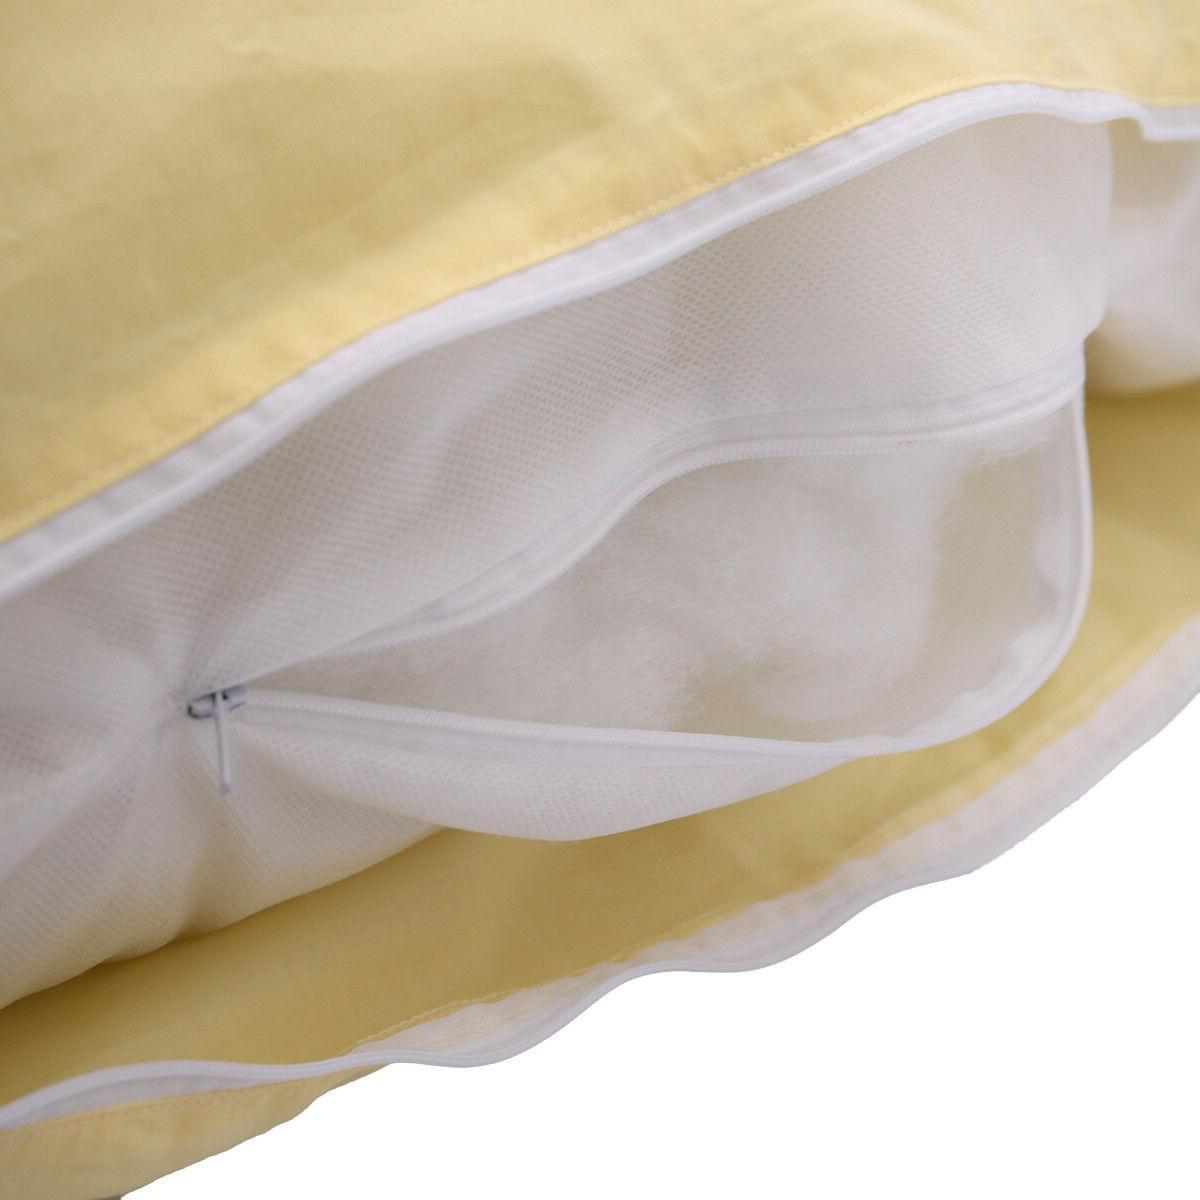 U Contoured Pregnancy w/ Zippered Cover